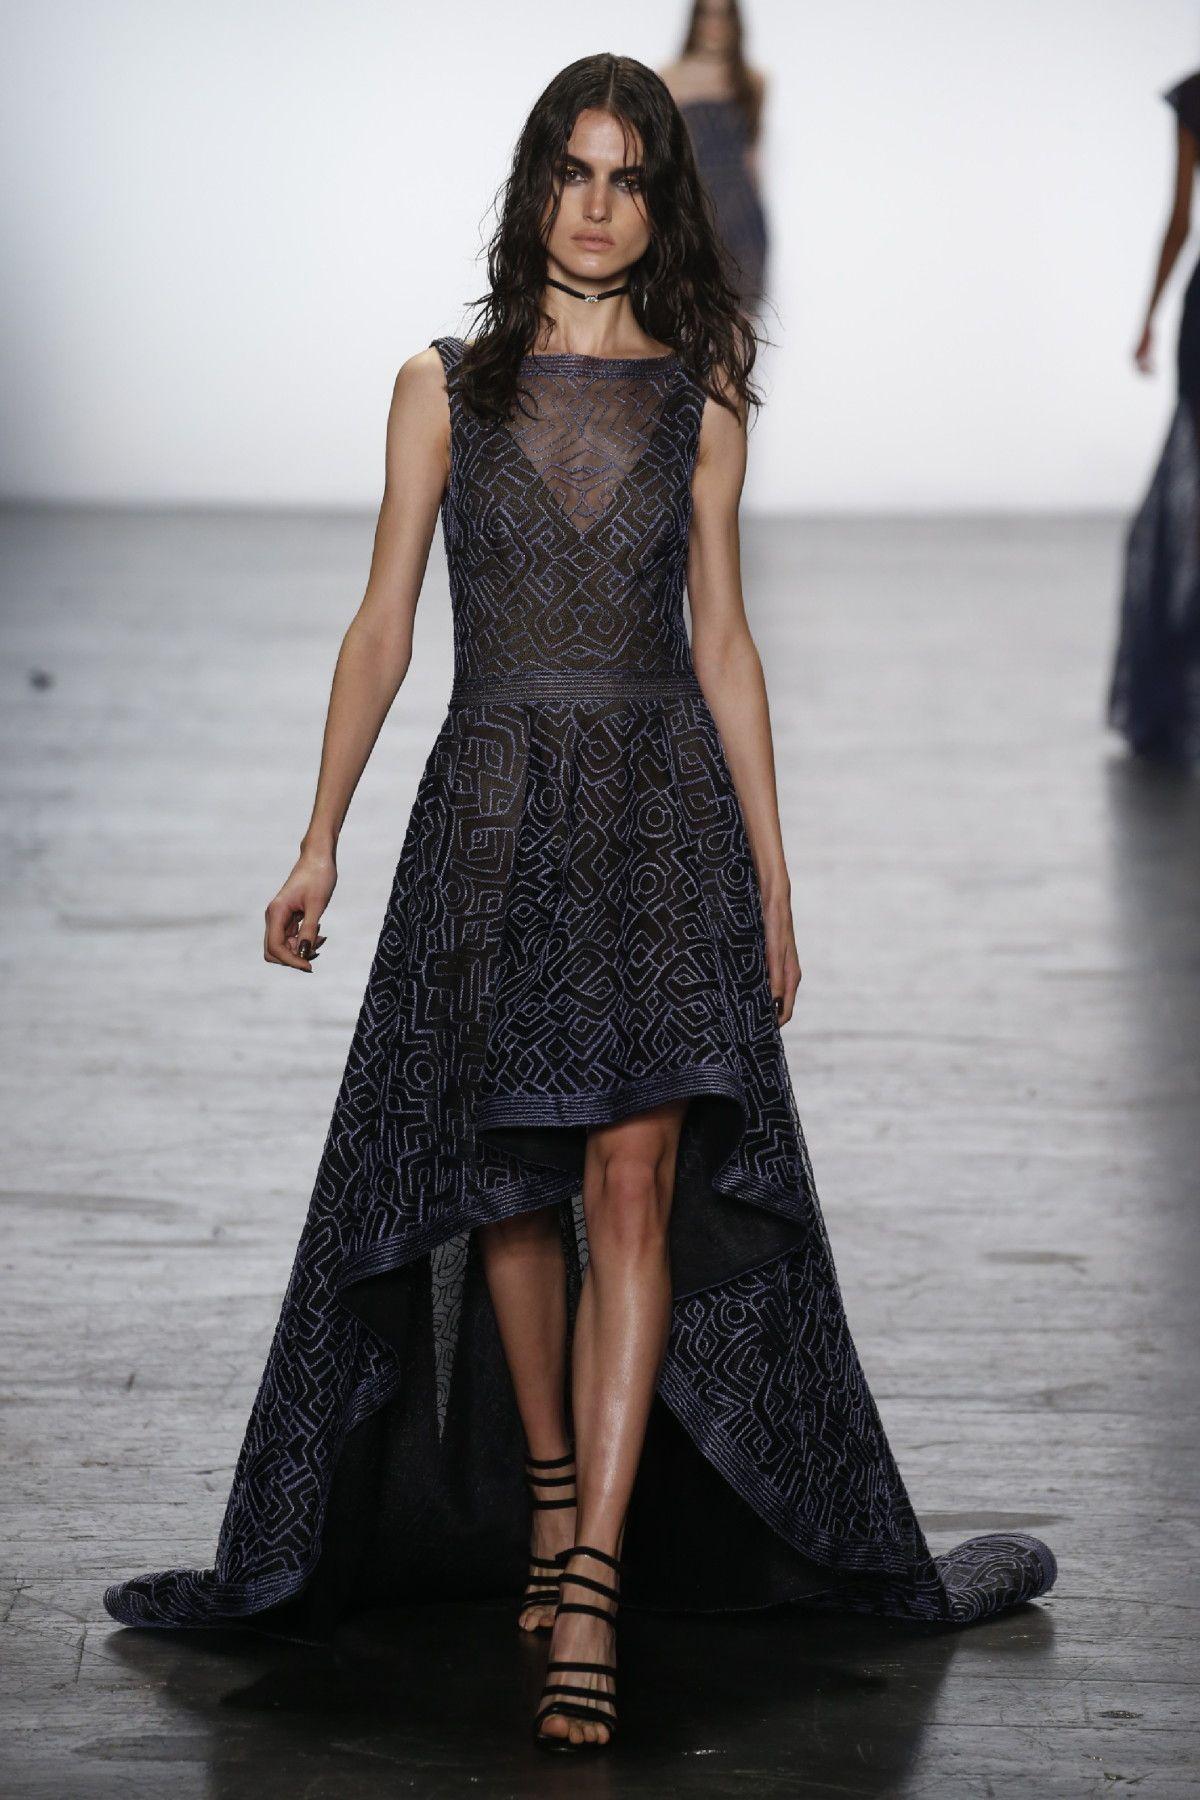 Lace button up wedding dress november 2018 Tadashi Shoji NYFW FW   FashionPaletteBlack  Pinterest